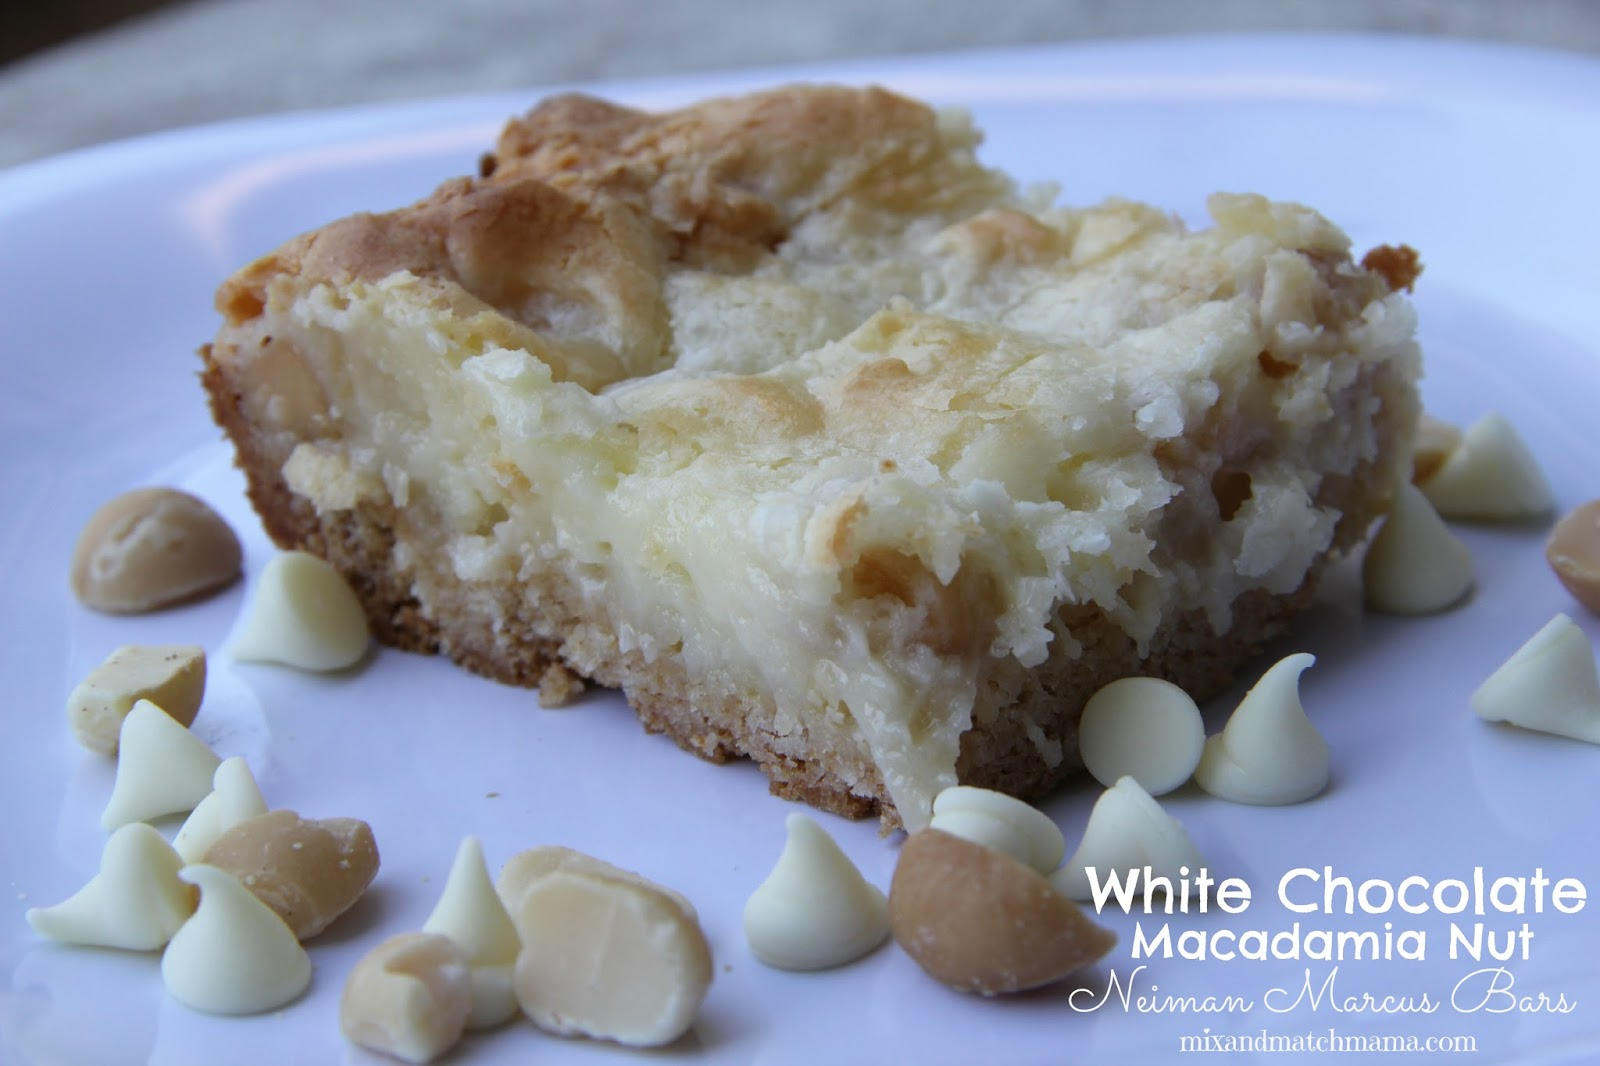 ... Match Mama: Bar 51: White Chocolate Macadamia Nut Neiman Marcus Bars